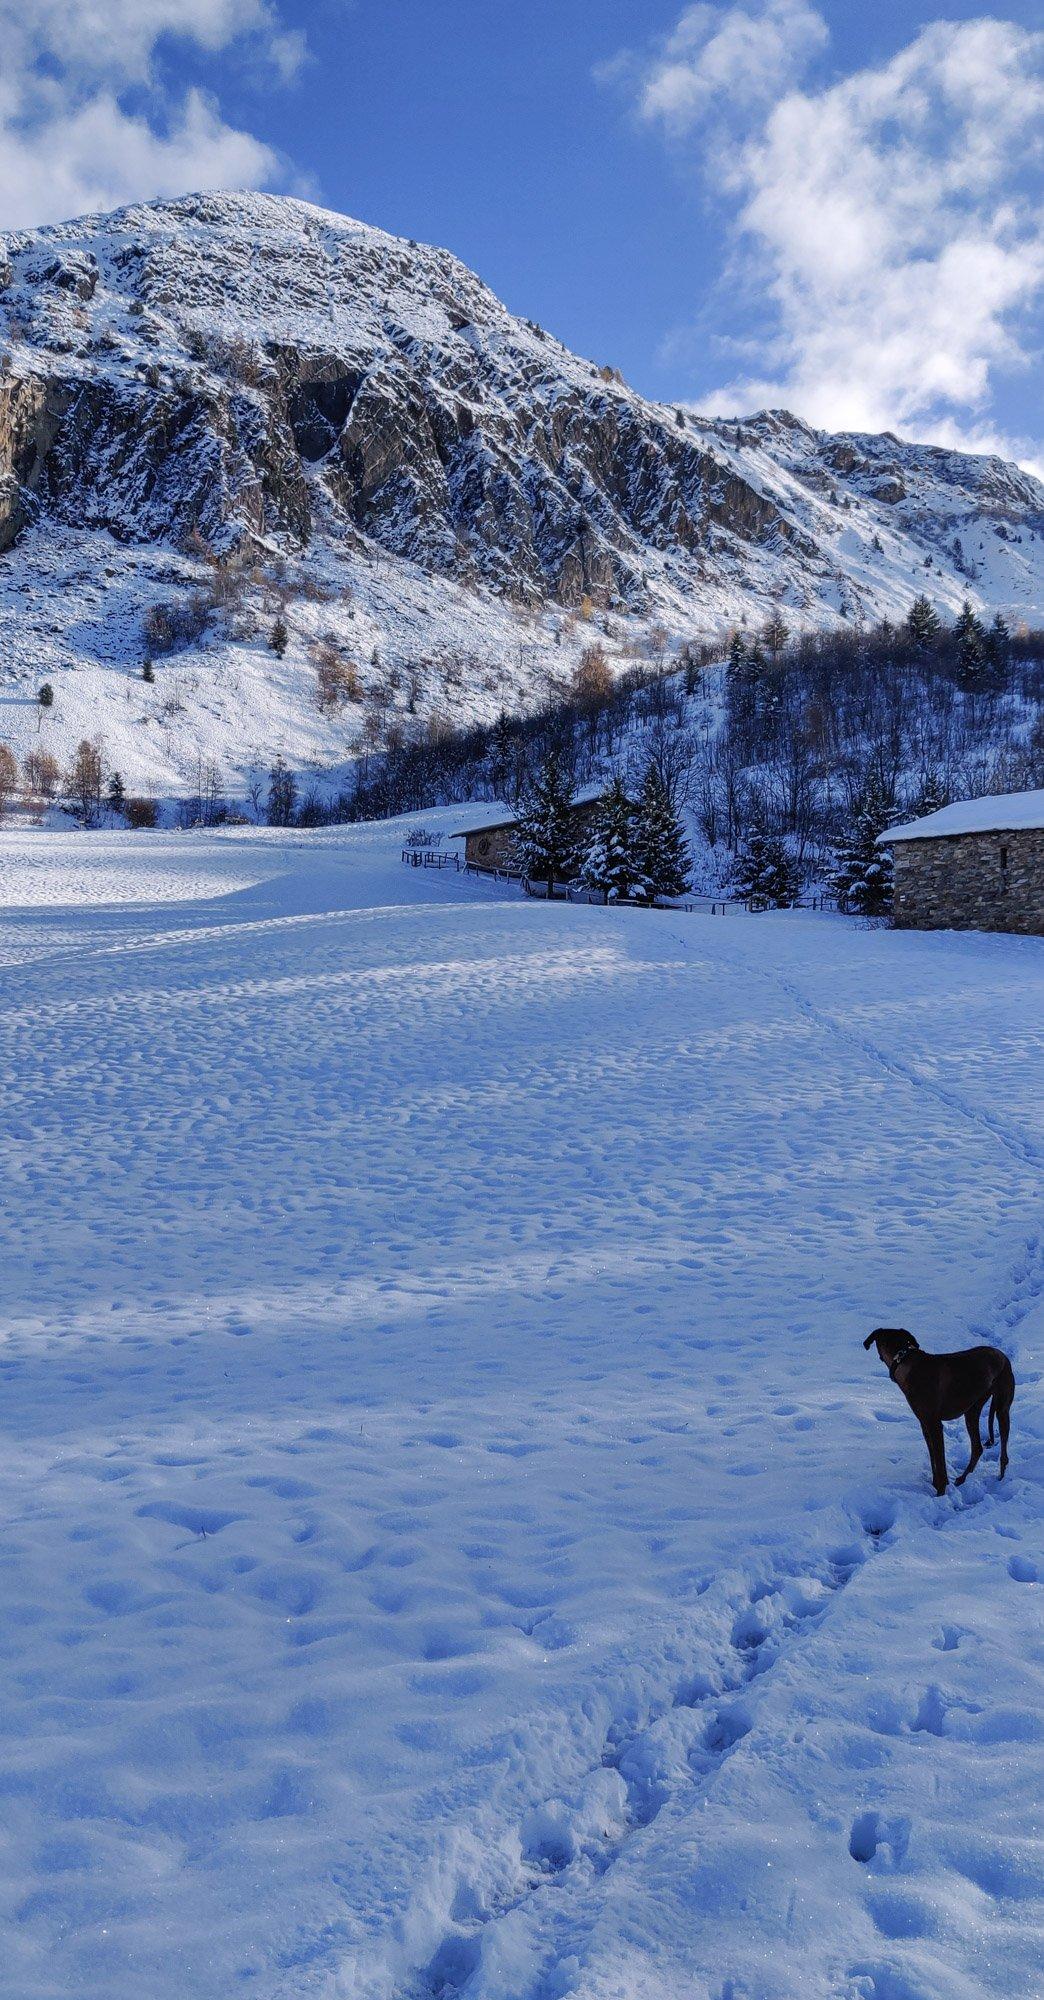 Winter walk in the Belleville Valley - First snow of 2019/29